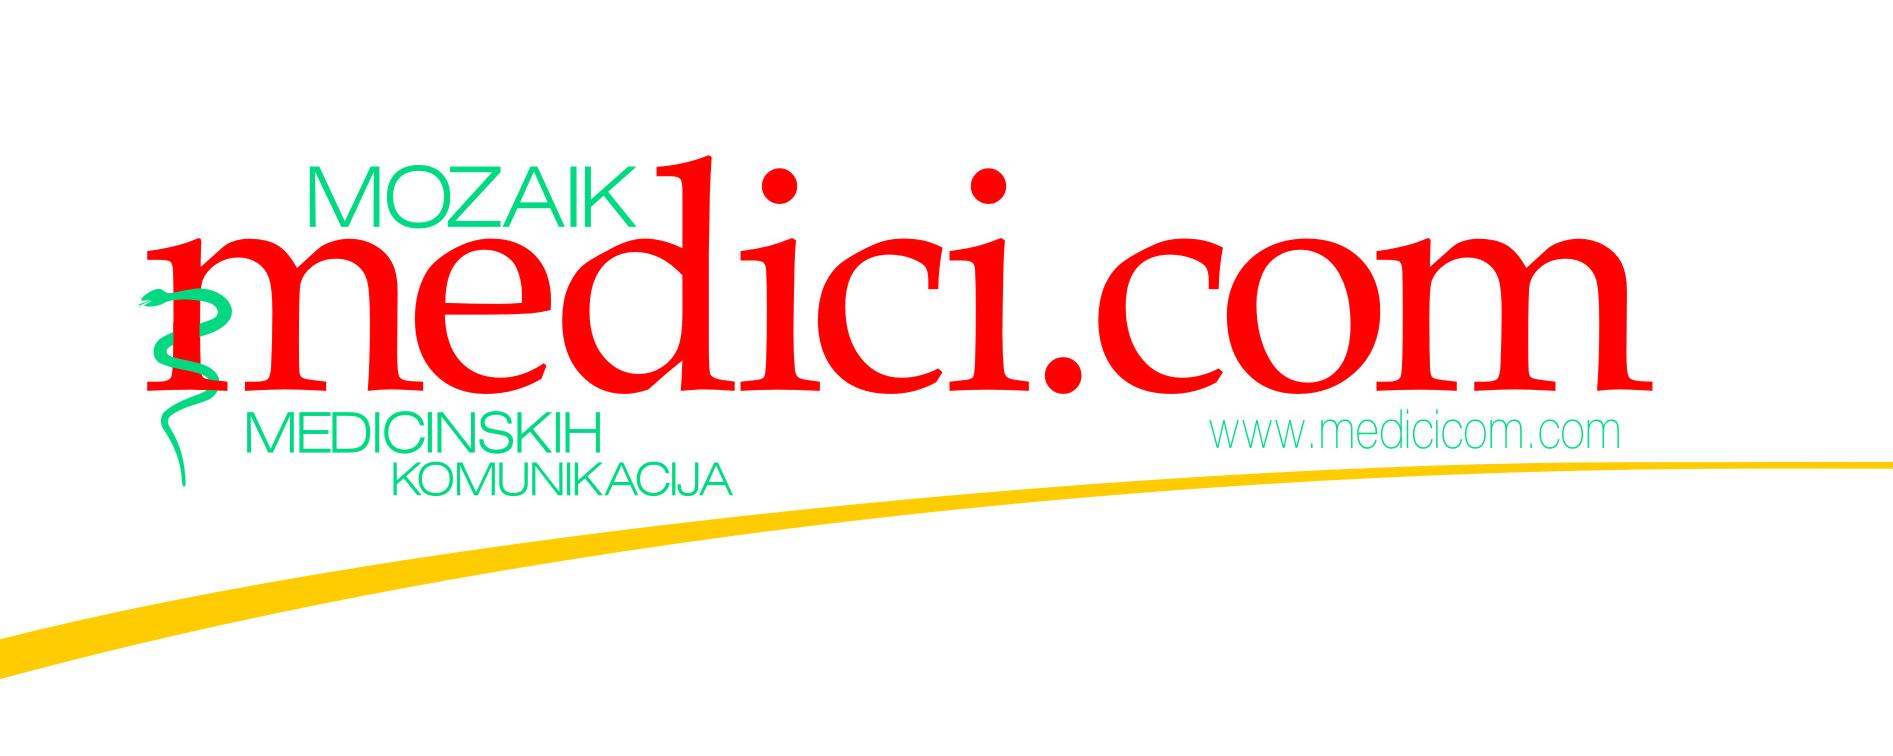 medici.com - Mozaik medicinskih komunikacija - LOGO